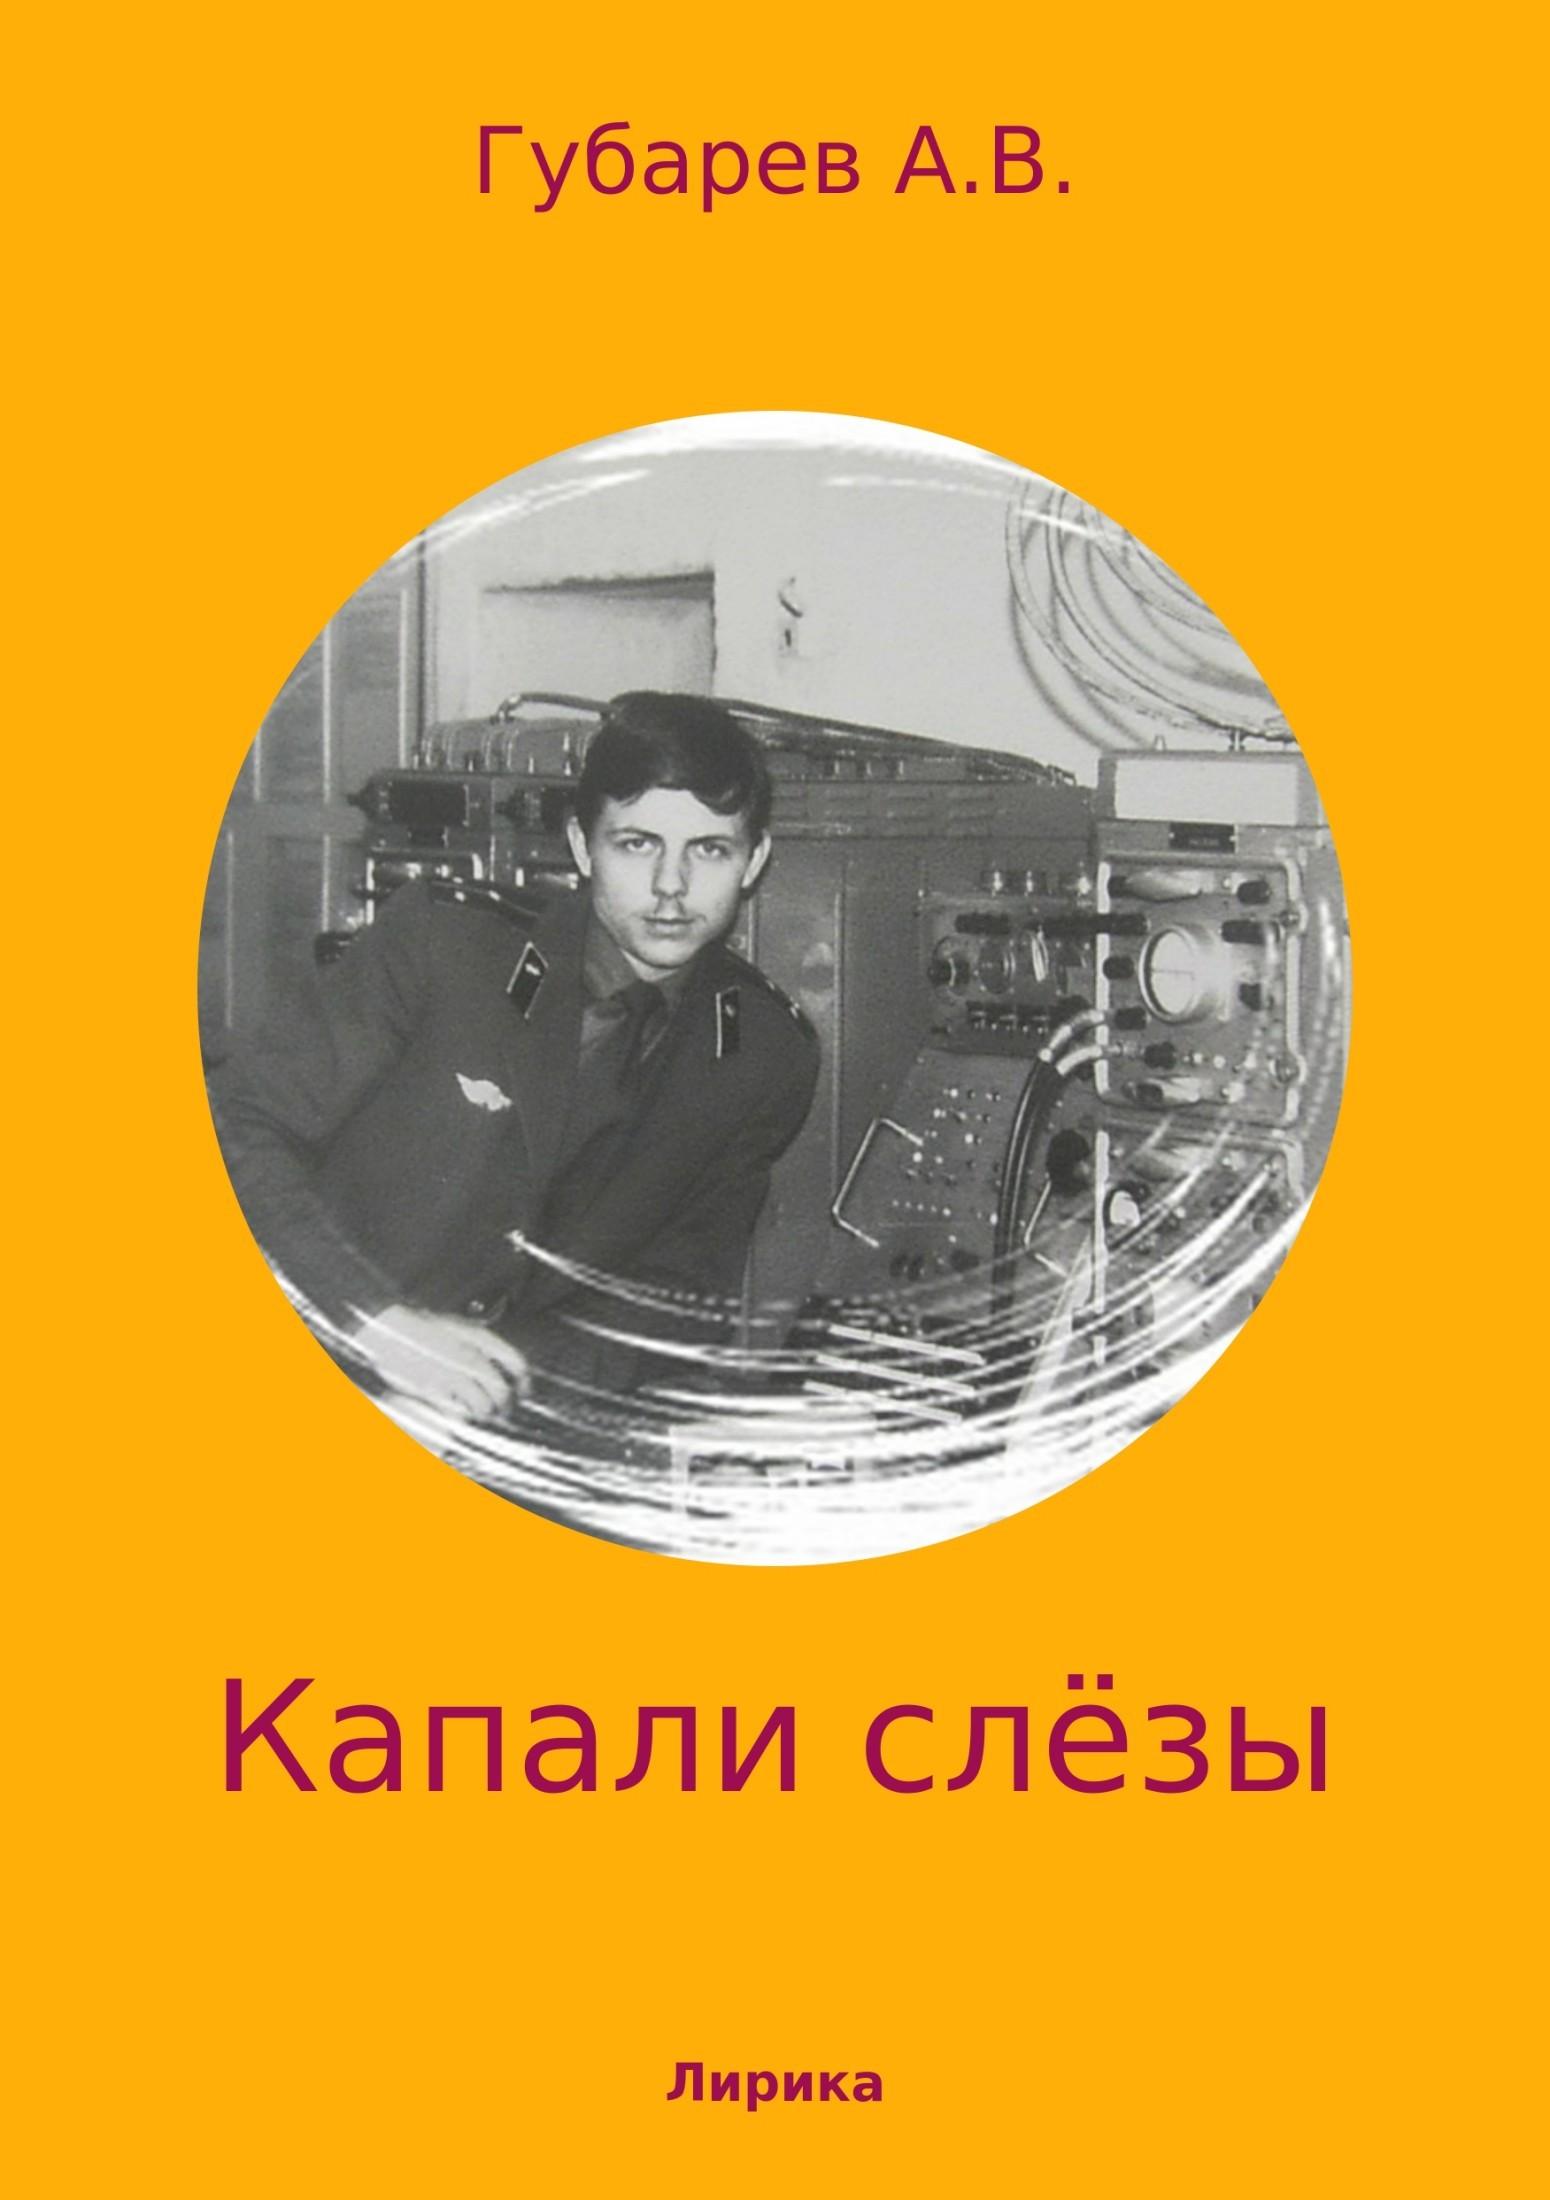 Алексей Васильевич Губарев Капали слёзы. Сборник стихотворений